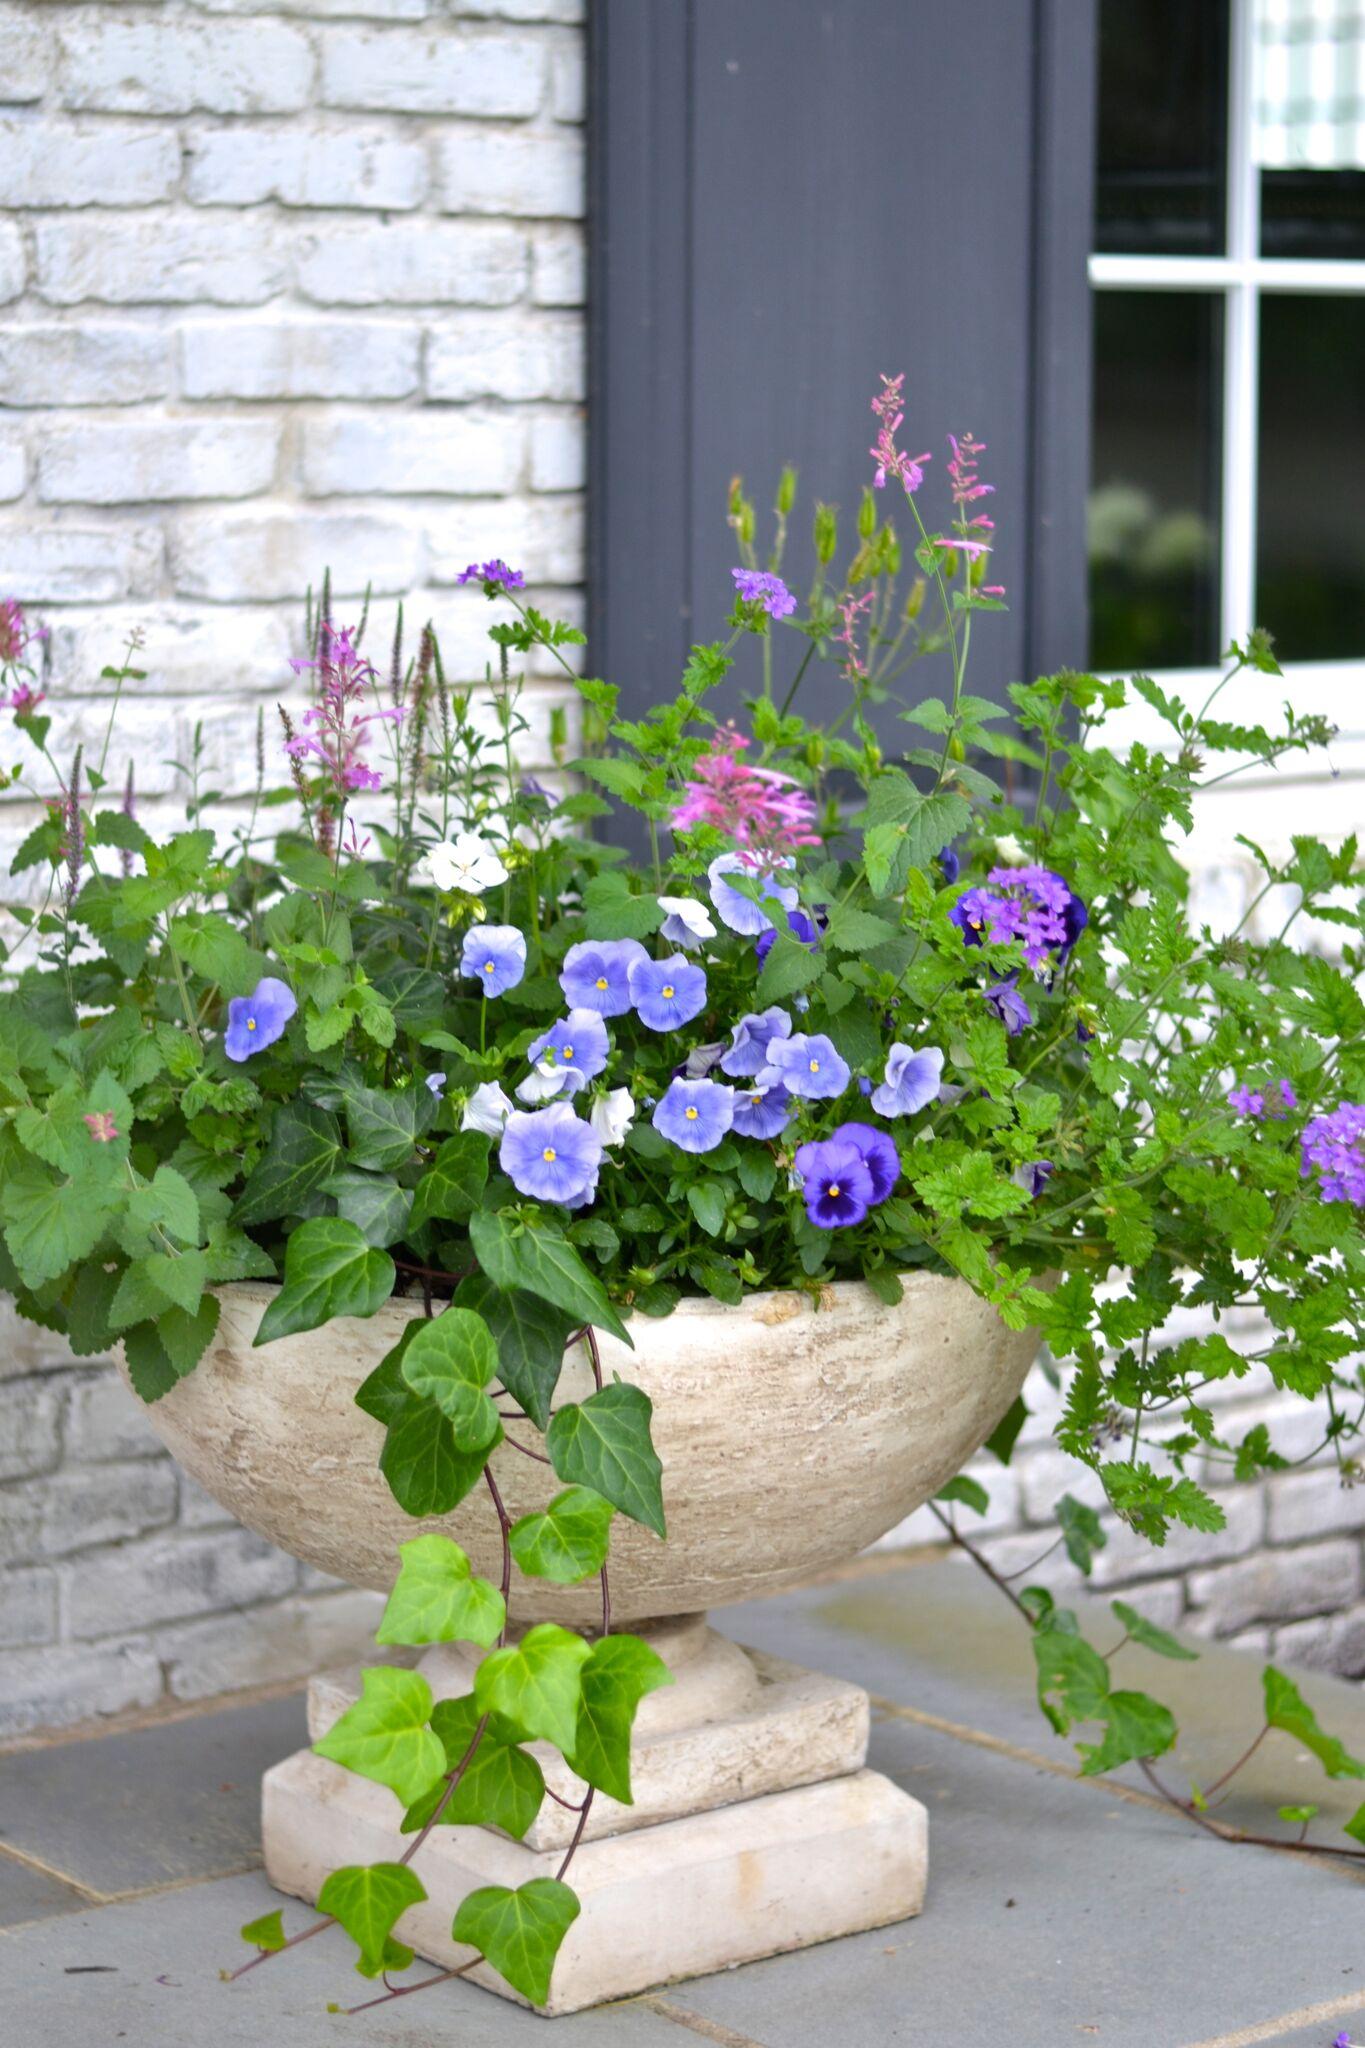 les-fleurs-home-gardening-benefits-potting.jpg